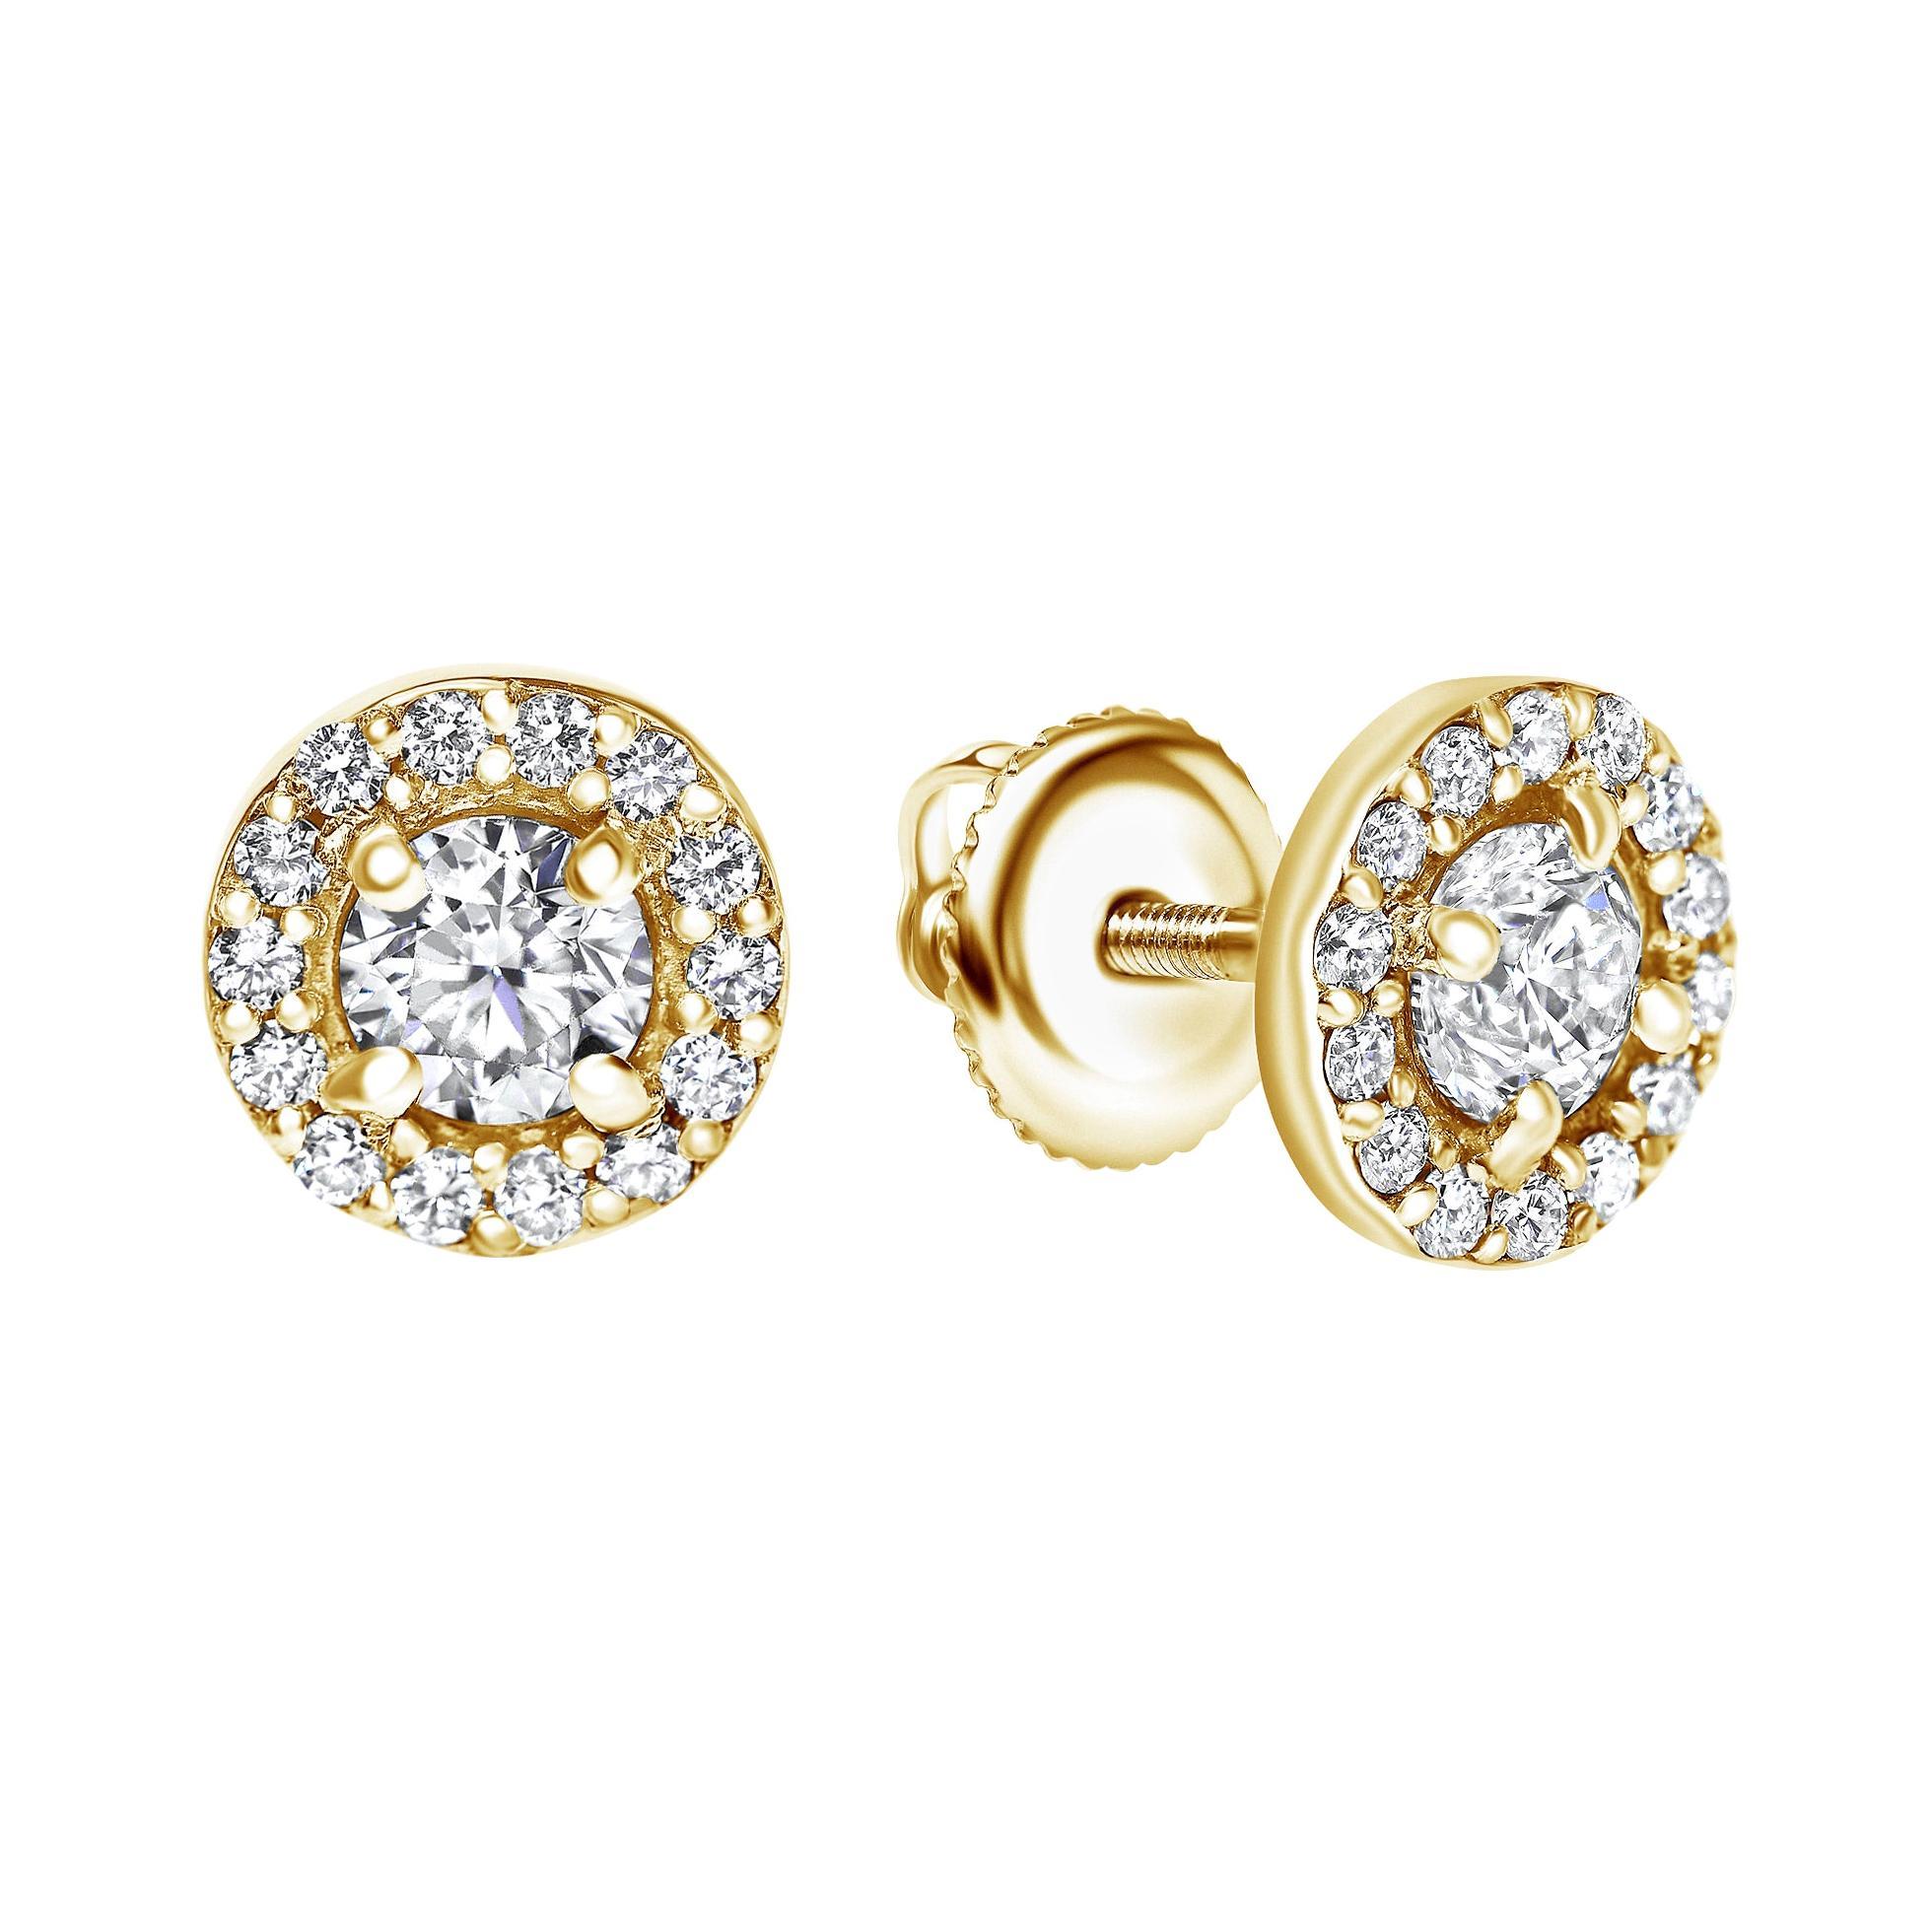 0.84 Carat Diamond Large Halo Earrings in 14 Karat Yellow Gold, Shlomit Rogel